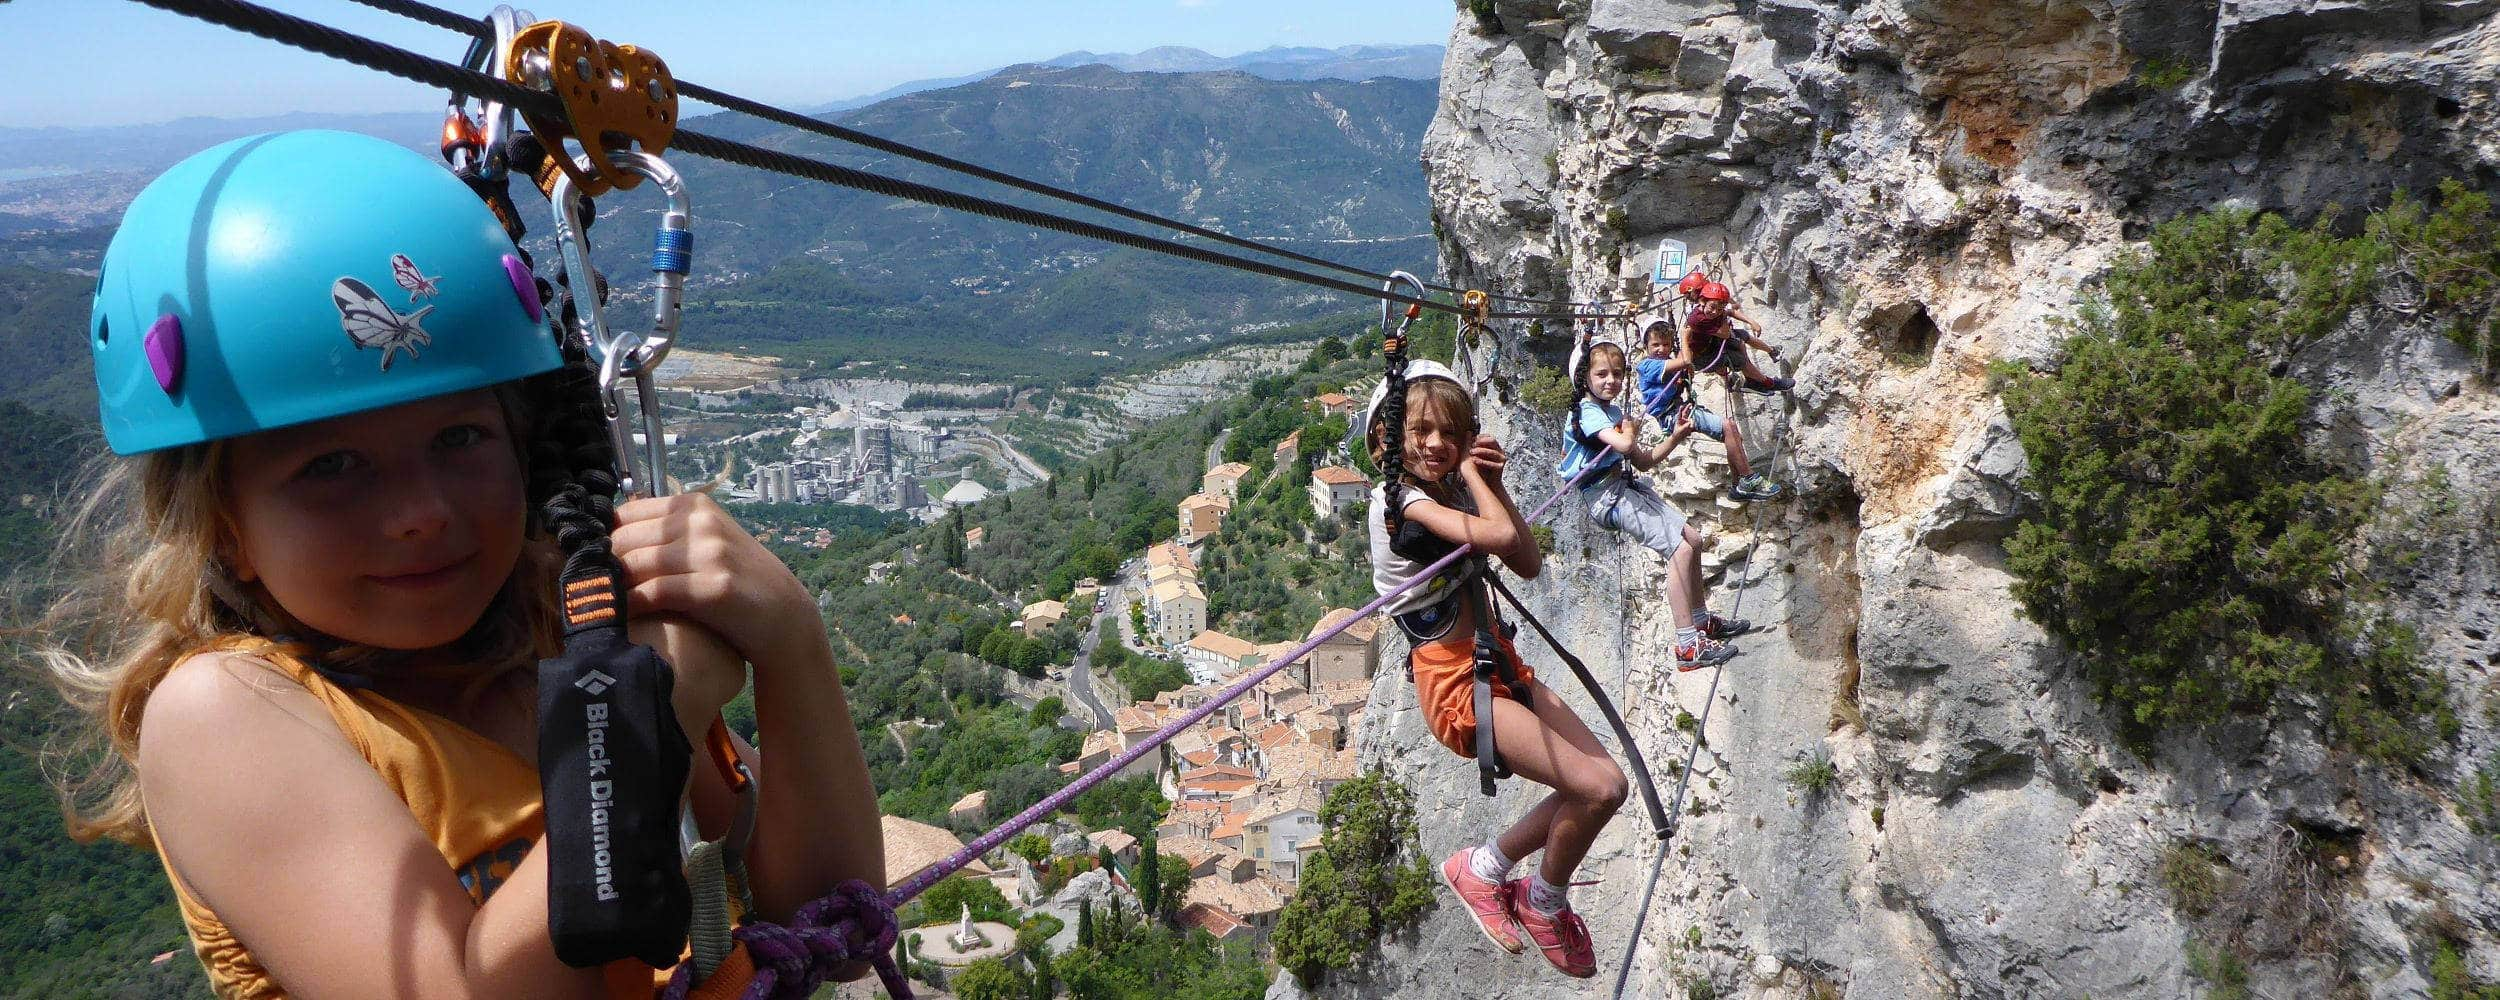 Via Ferrata Kids Cote d'Azur - Nice